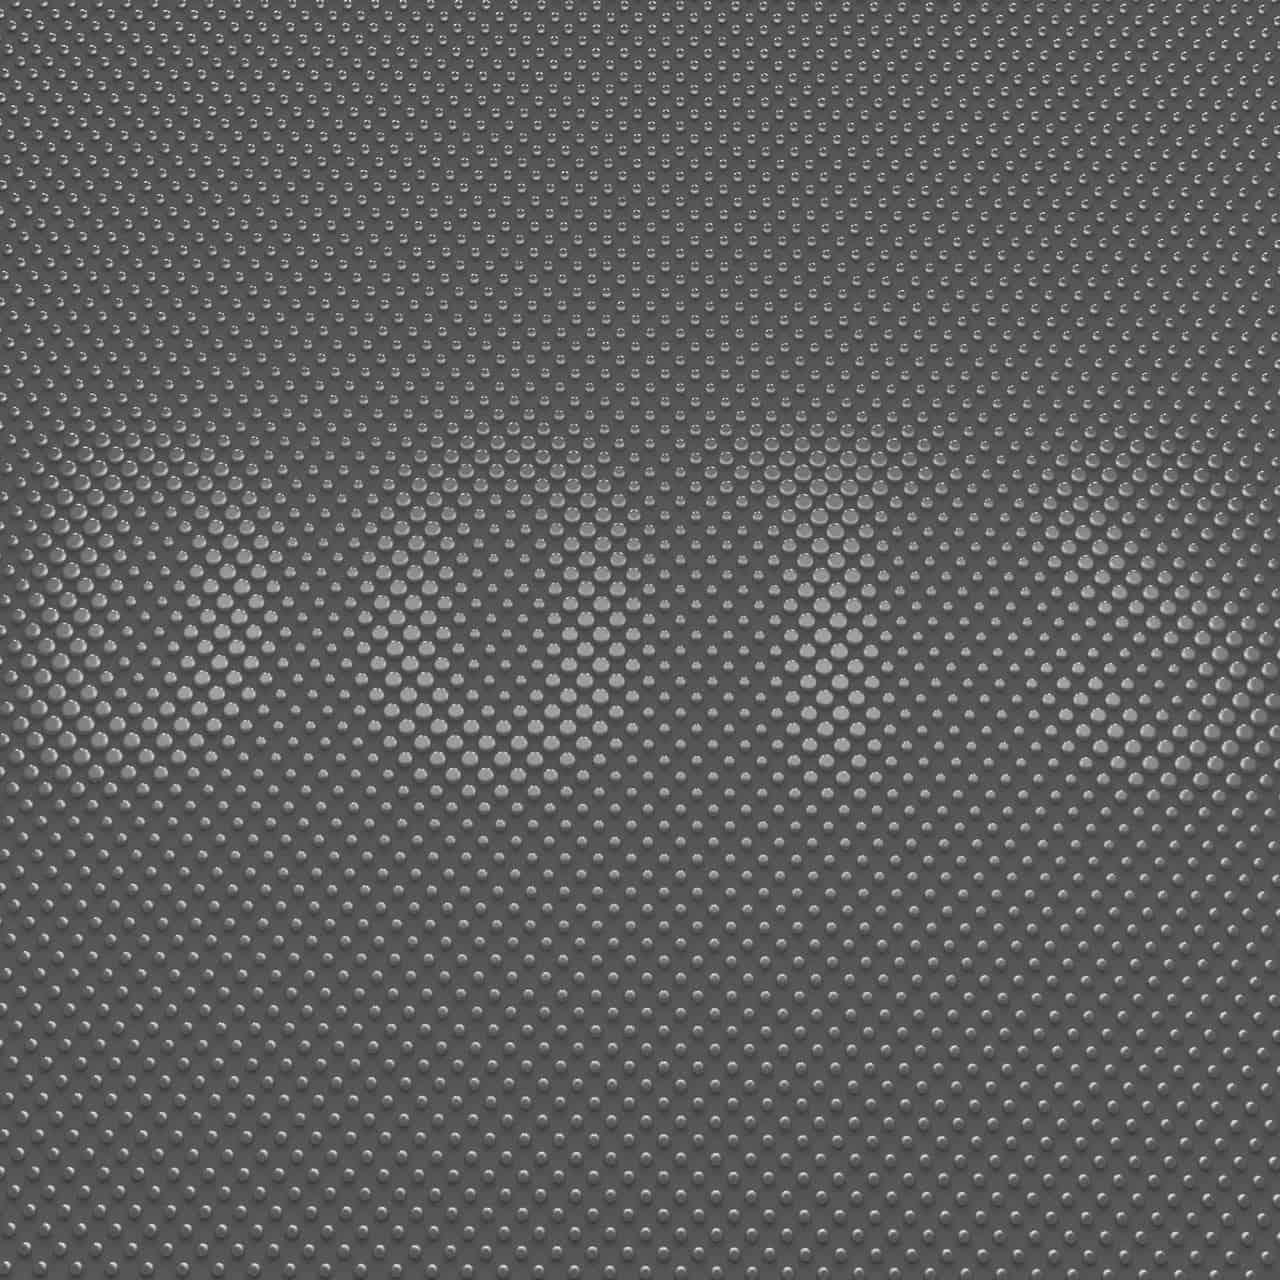 dots3.jpg